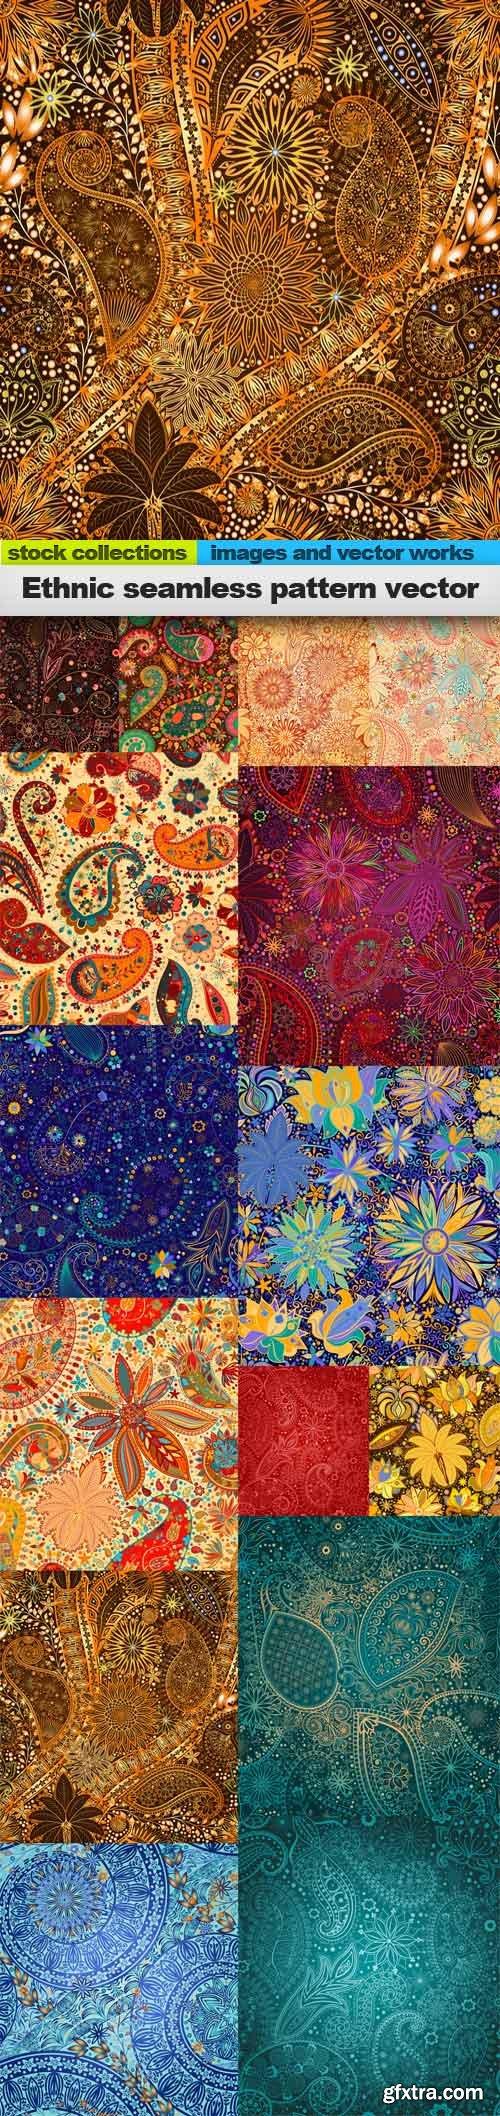 Ethnic seamless pattern vector, 15 x EPS